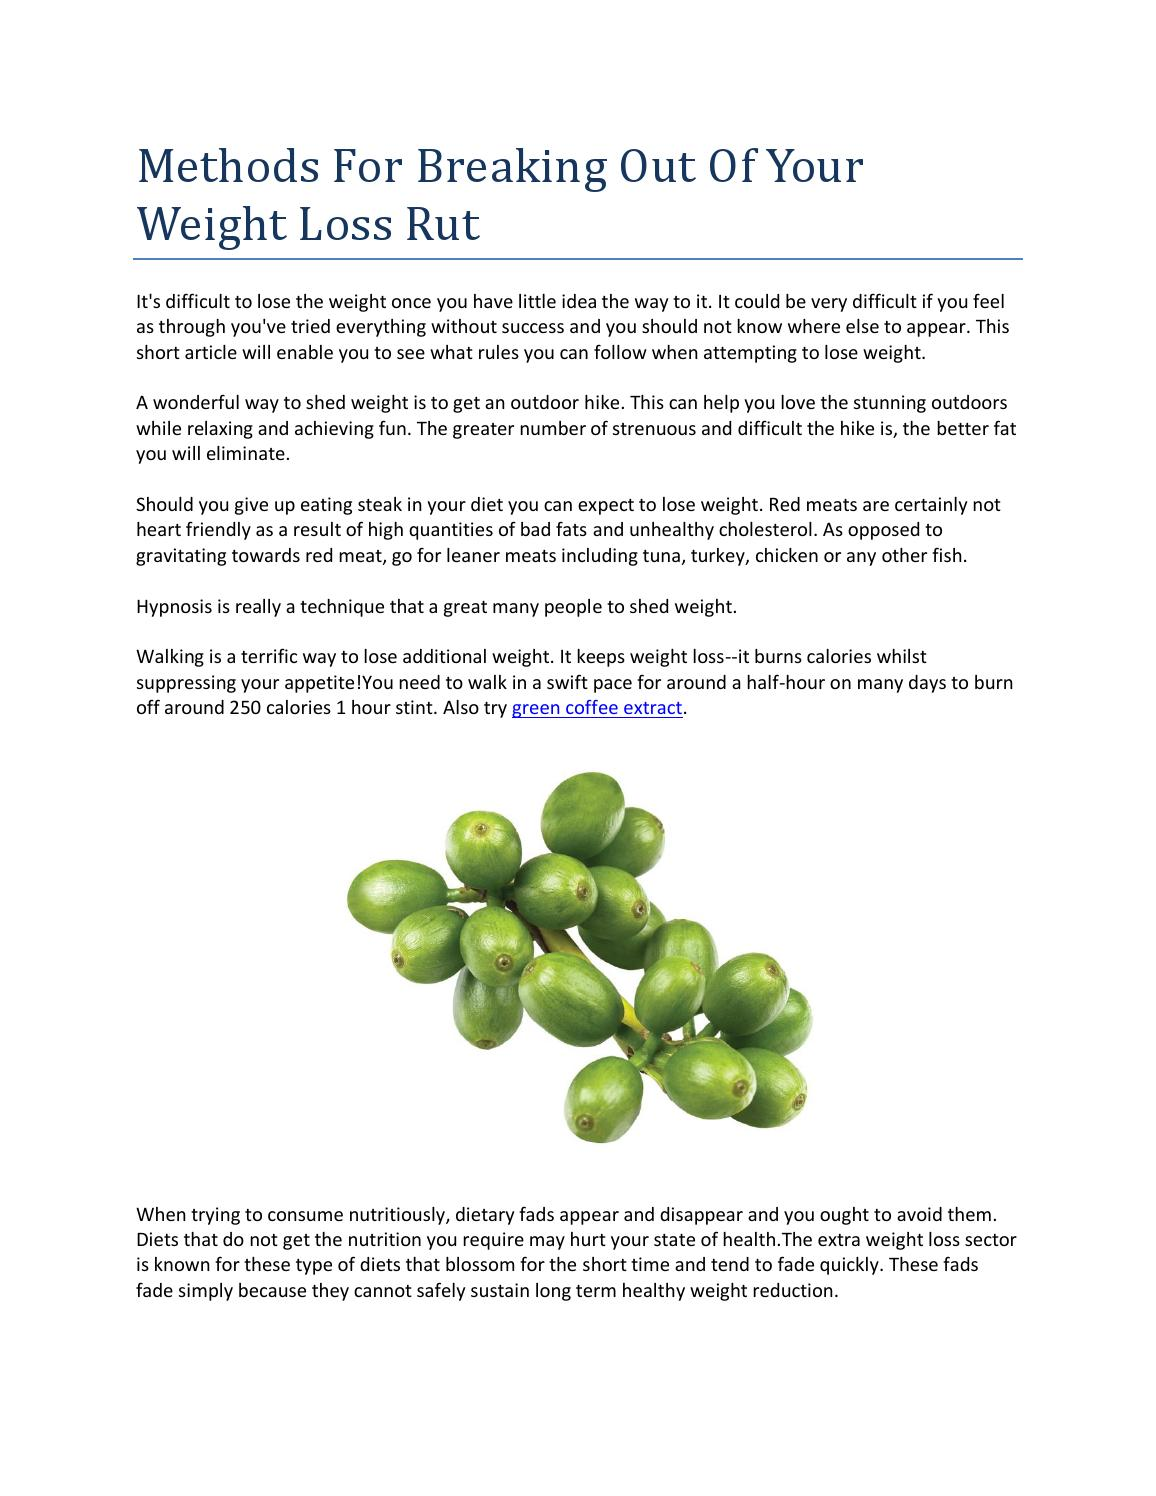 weight loss 33 reviews